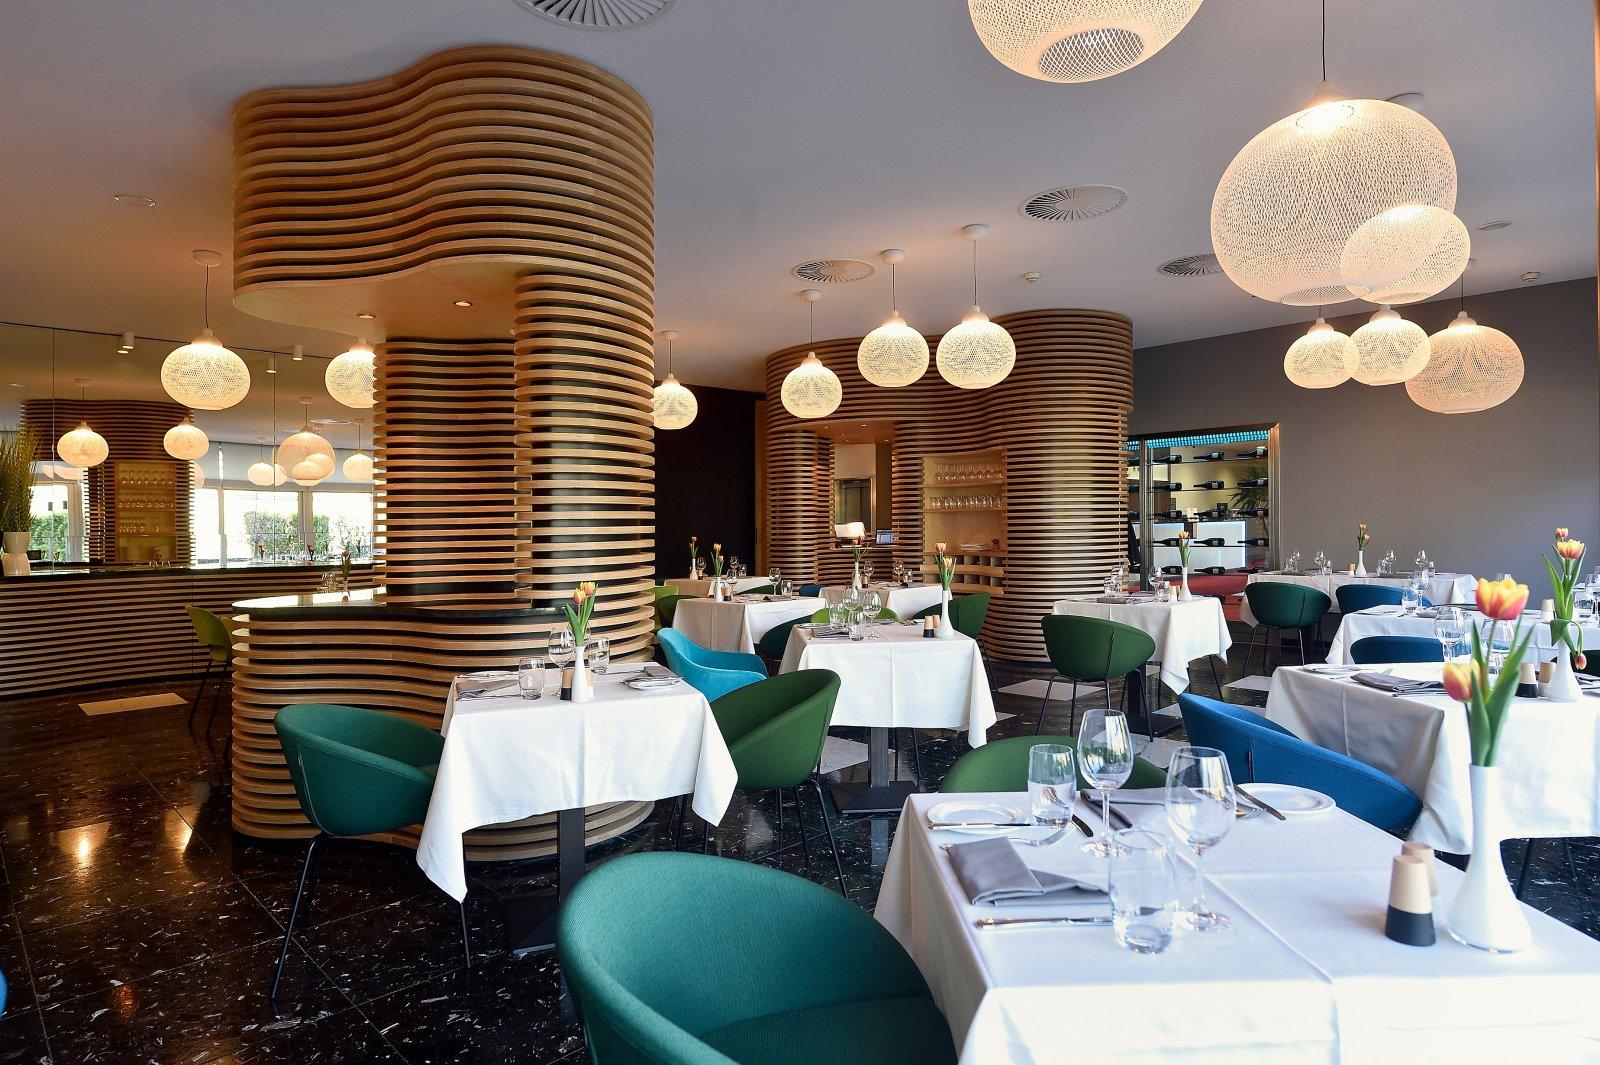 Hotels Vatel Martigny (Suisse) #28